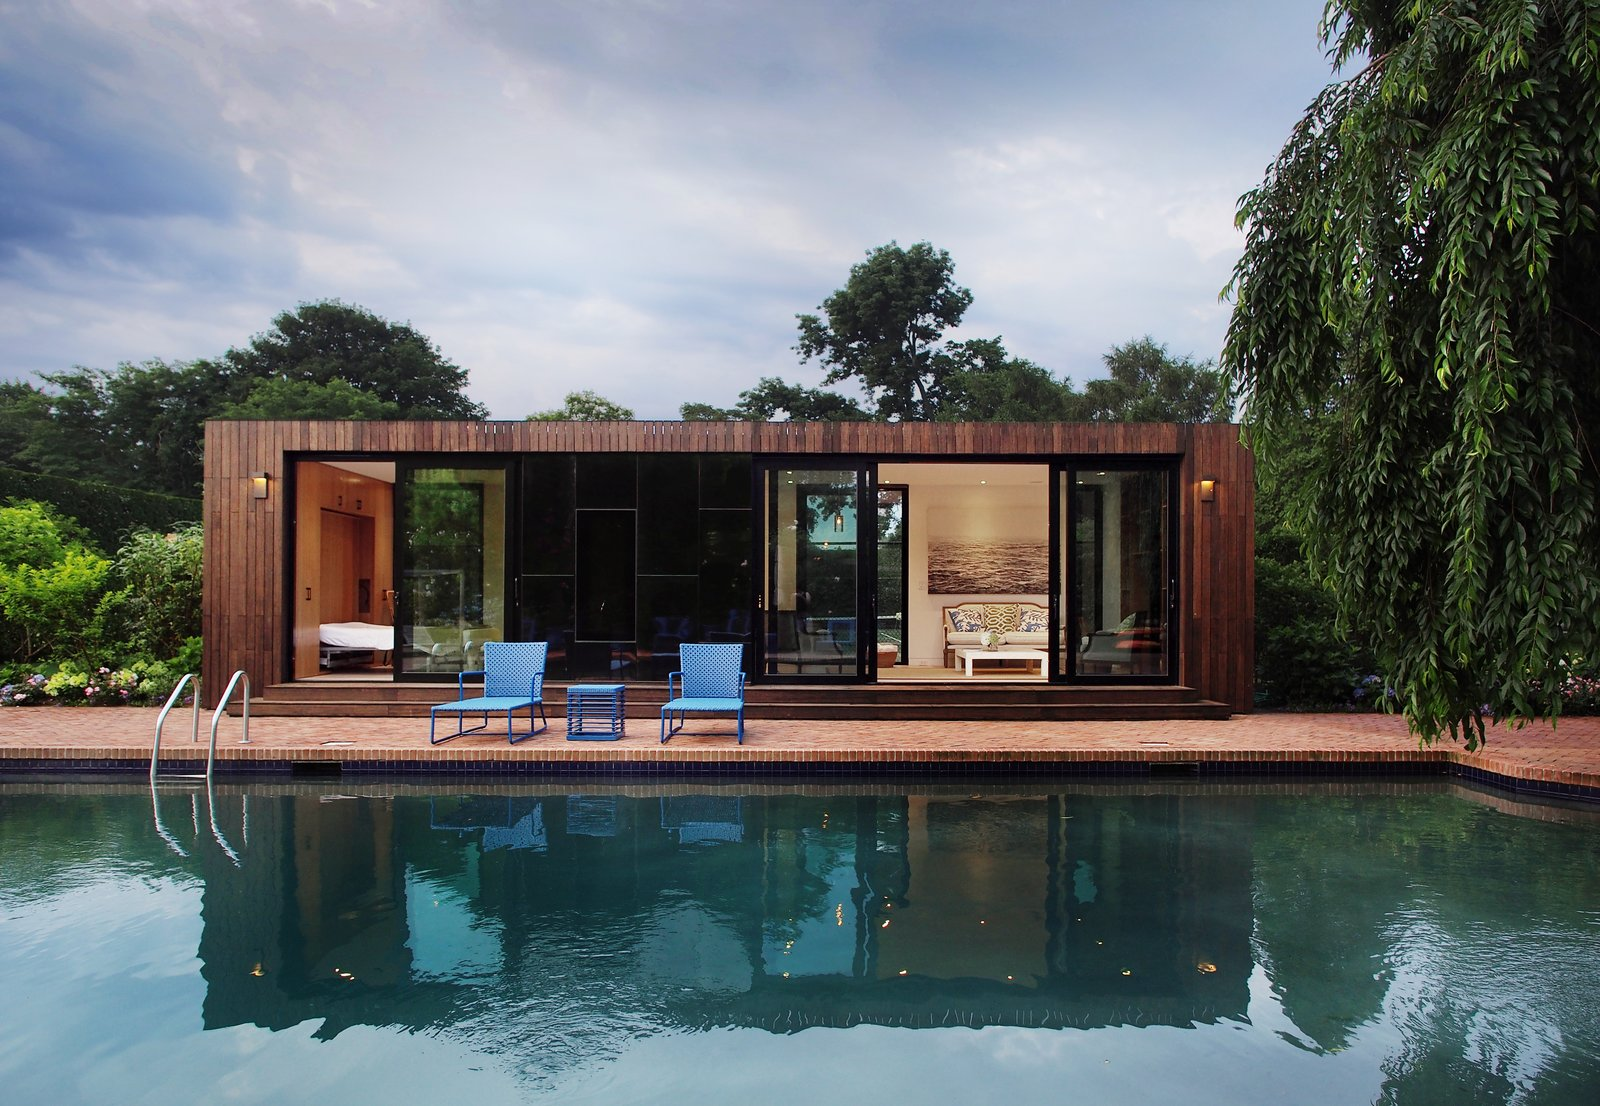 #prefab #pool #chair #modern #architecture #modernarchitecture #tree #glass